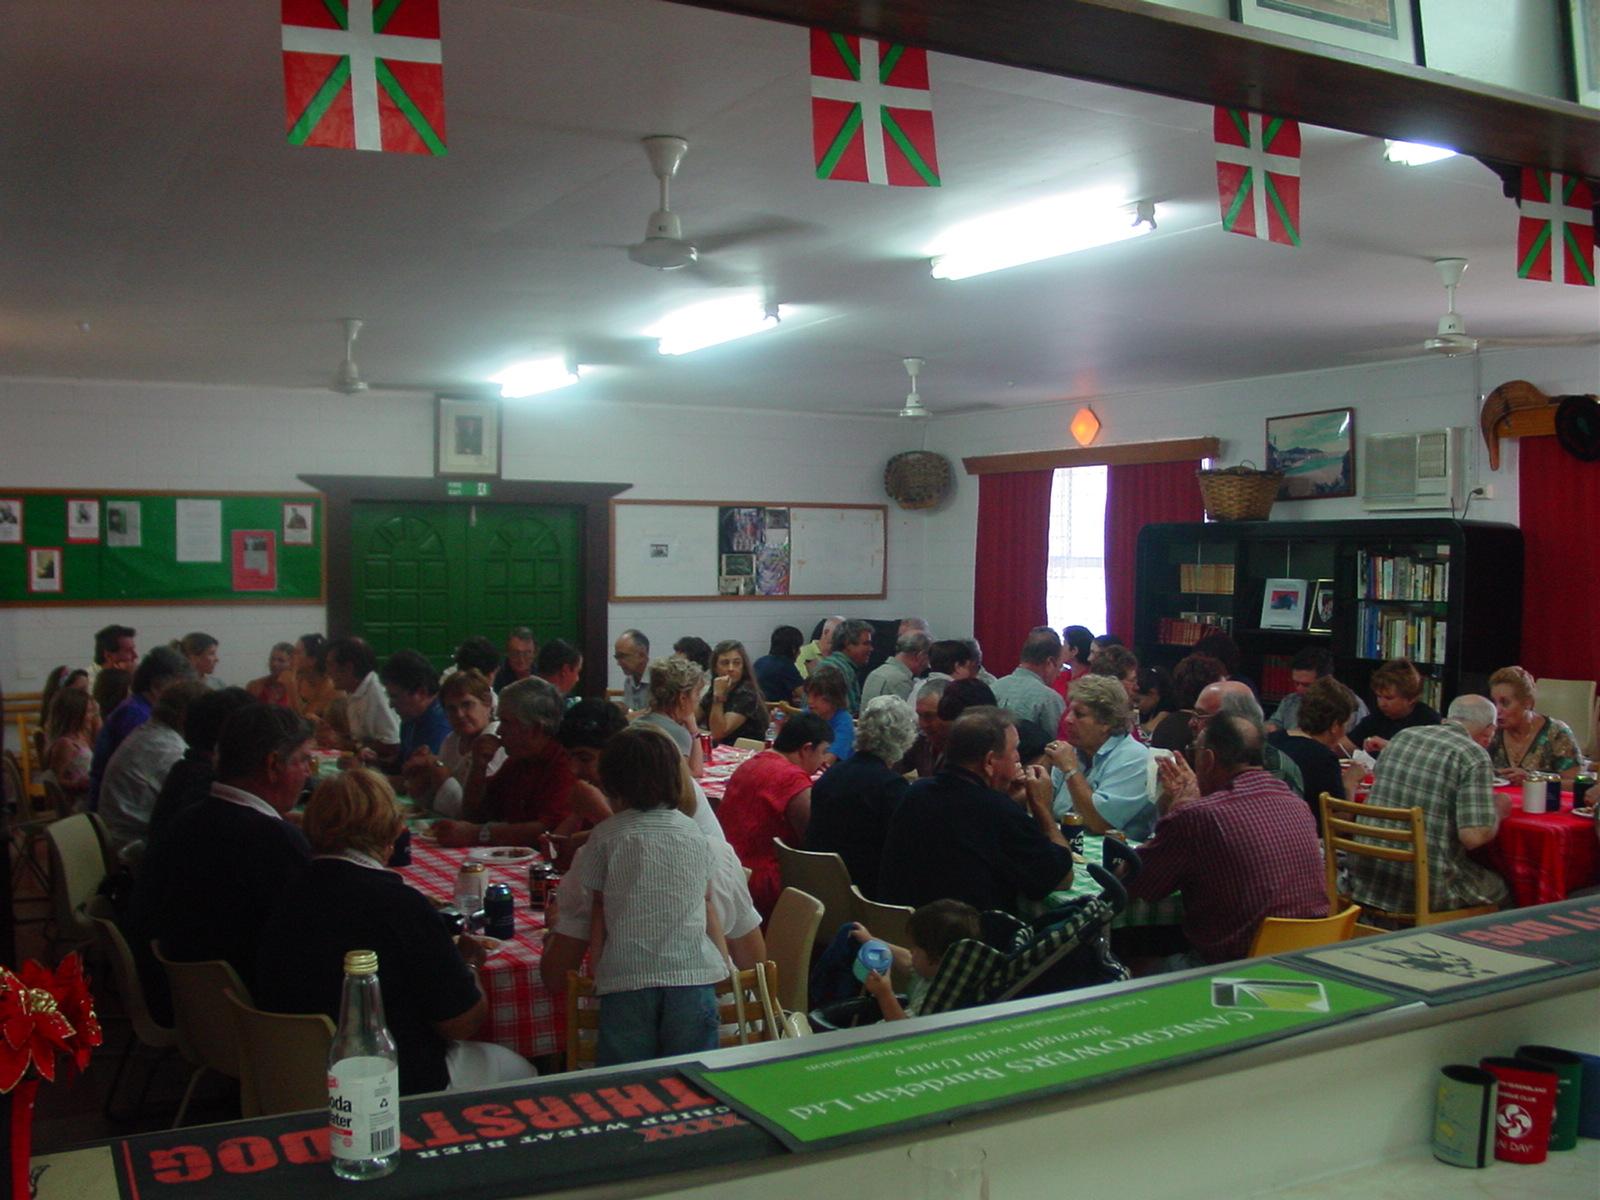 Celebración en la sede de Euskal Etxea de Townsville (foto EuskalKultura.com)